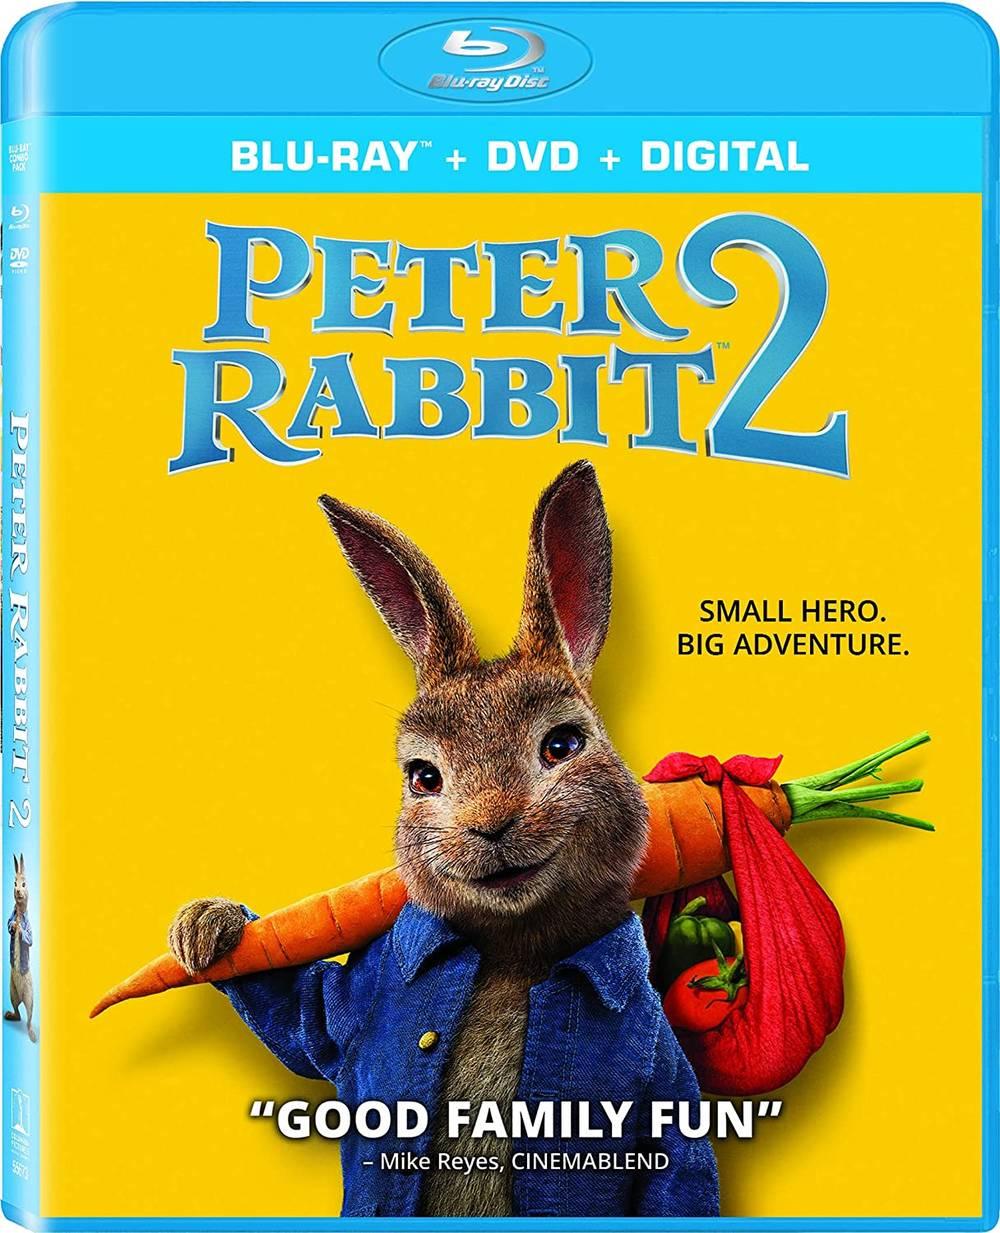 Peter Rabbit [Movie] - Peter Rabbit 2